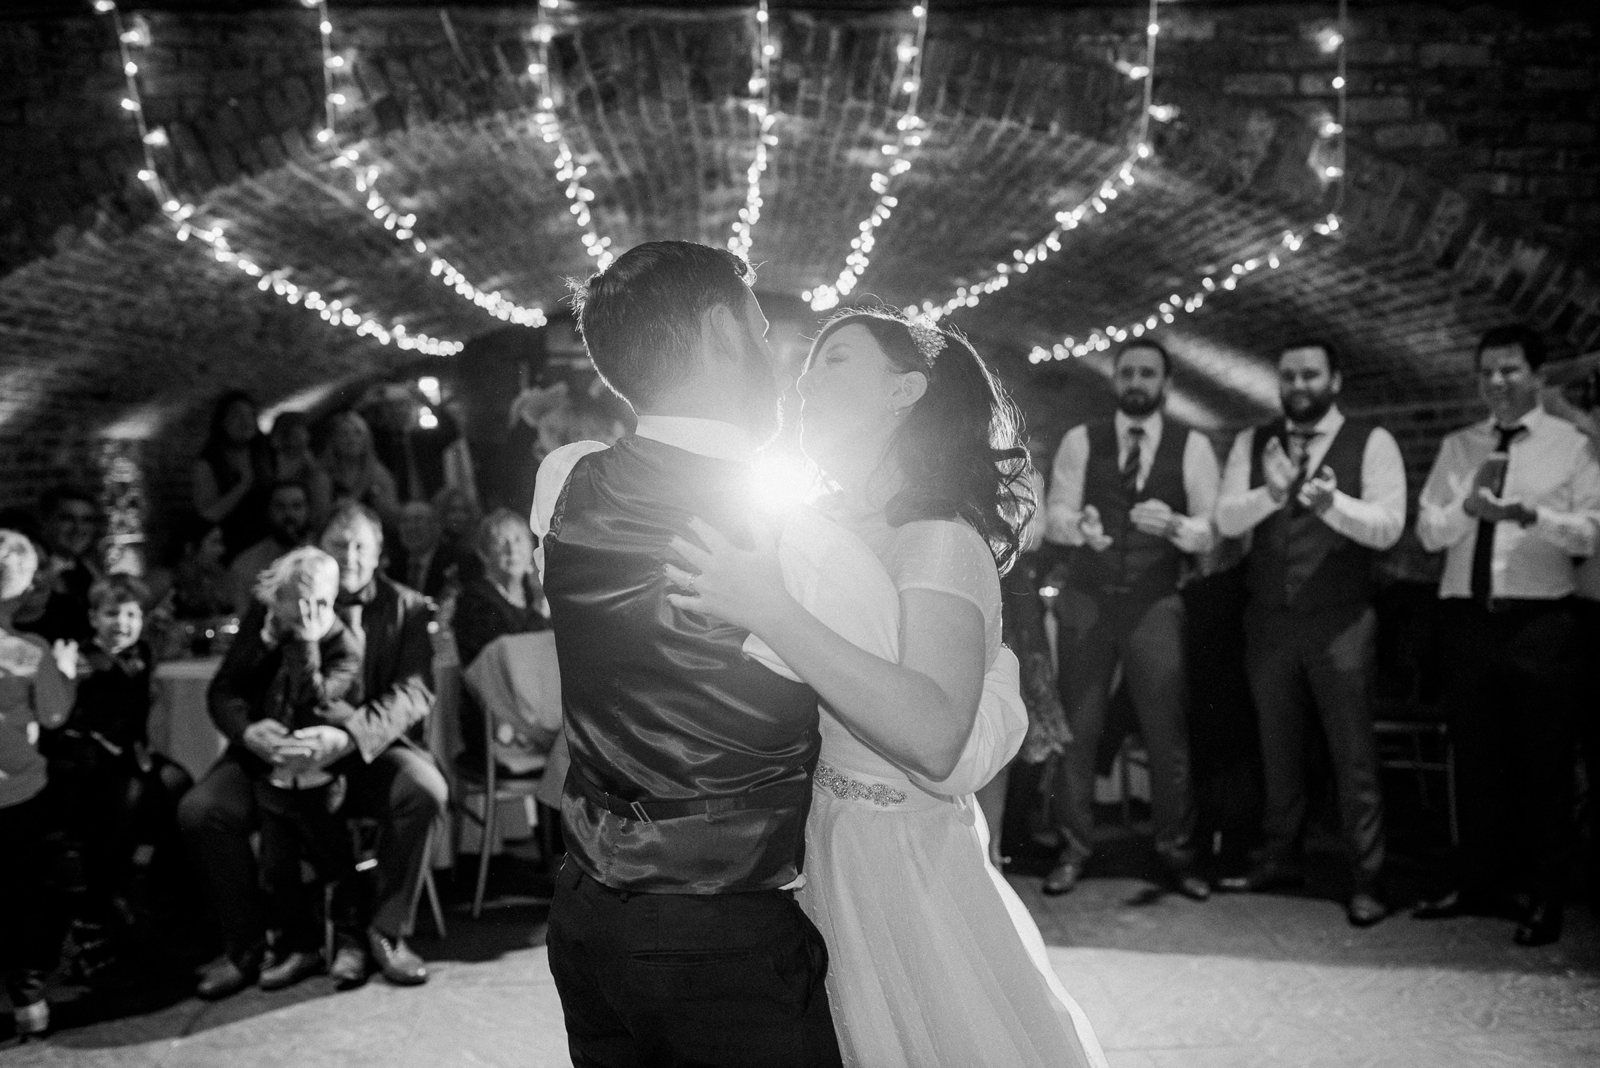 thecaves_retro_DIY_wedding_00119.jpg